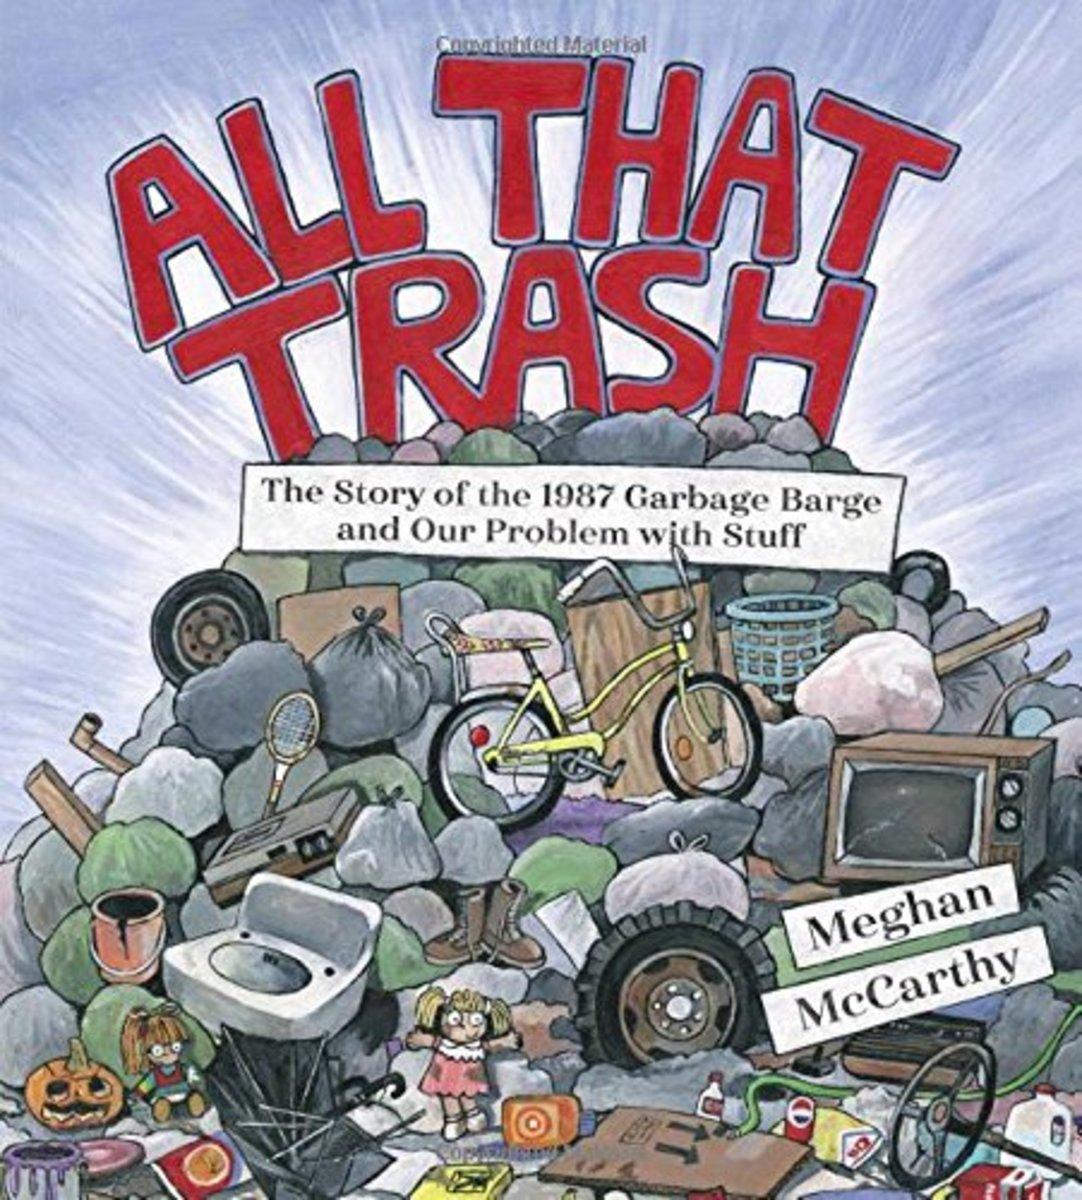 All That Trash by Meghan McCarthy